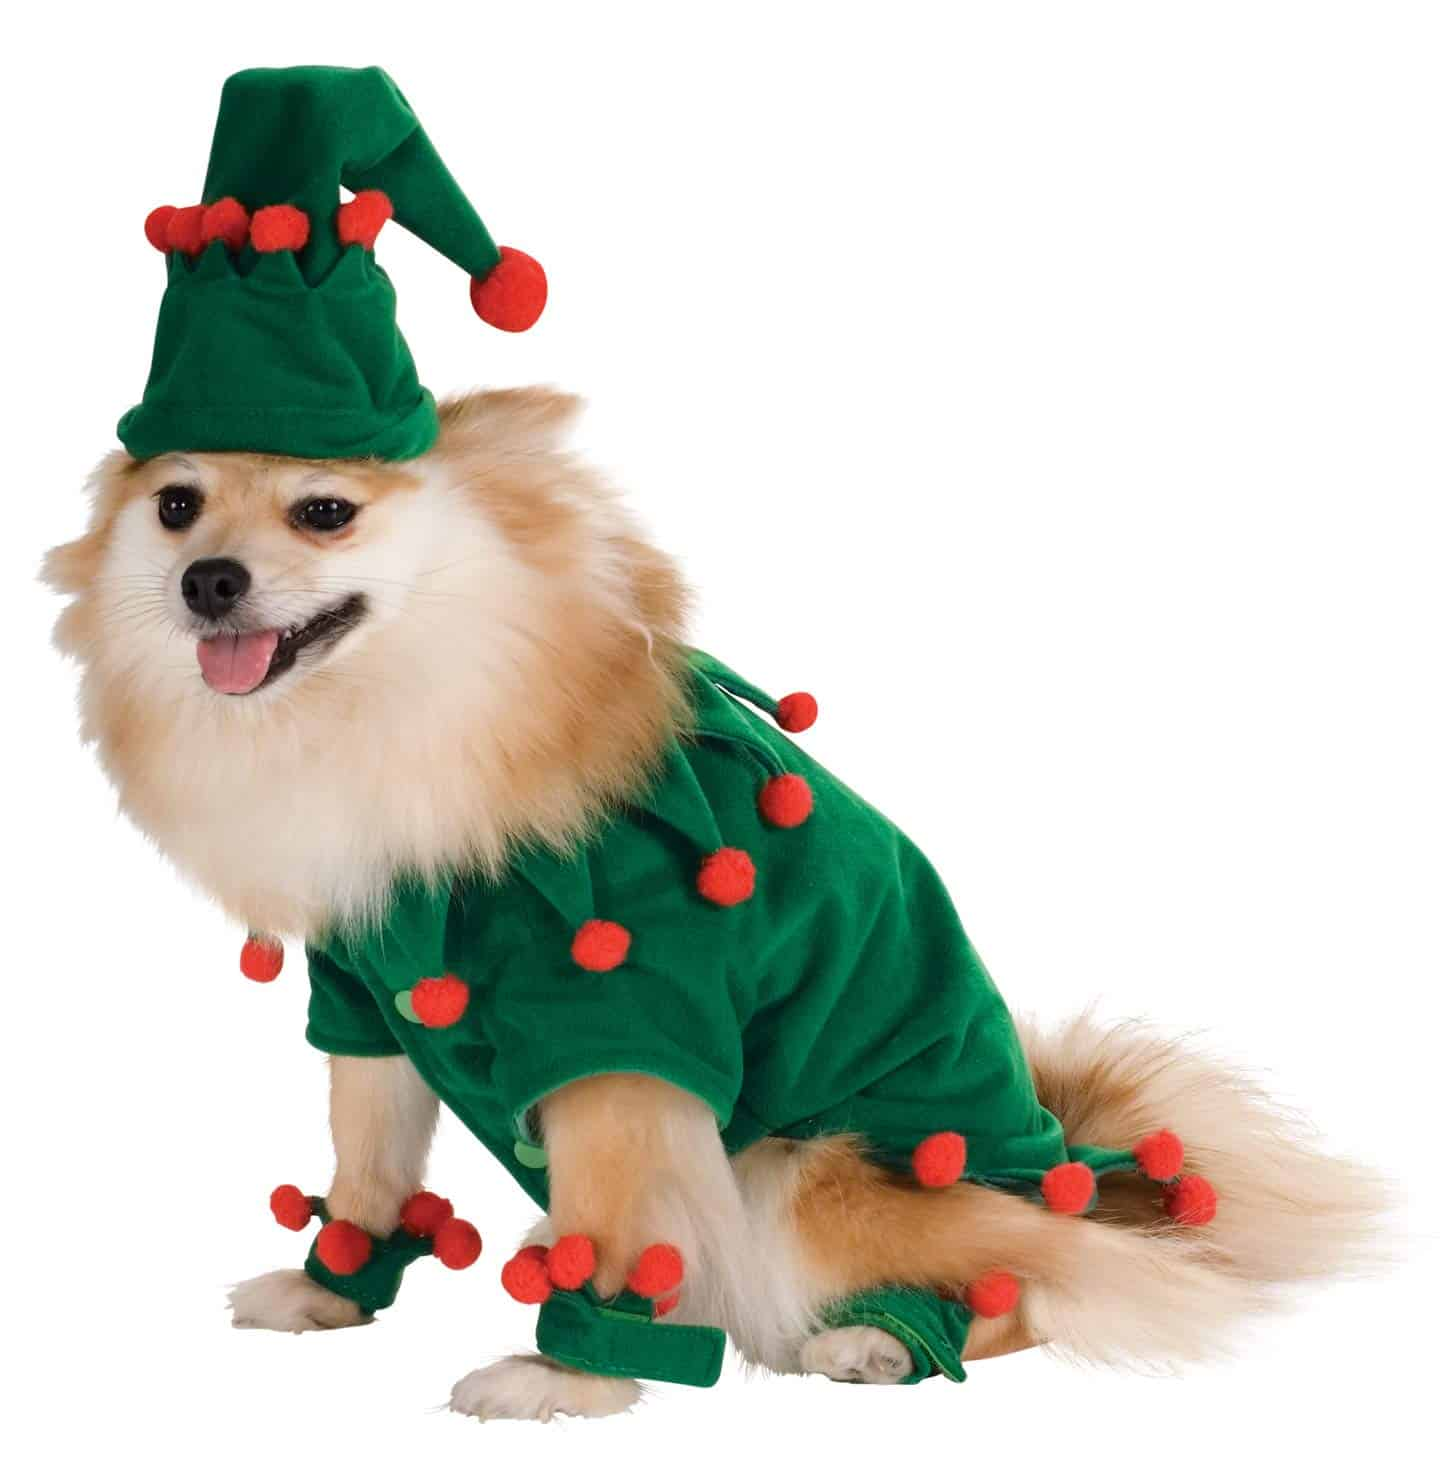 Cute Dog Christmas Green Elf Costume